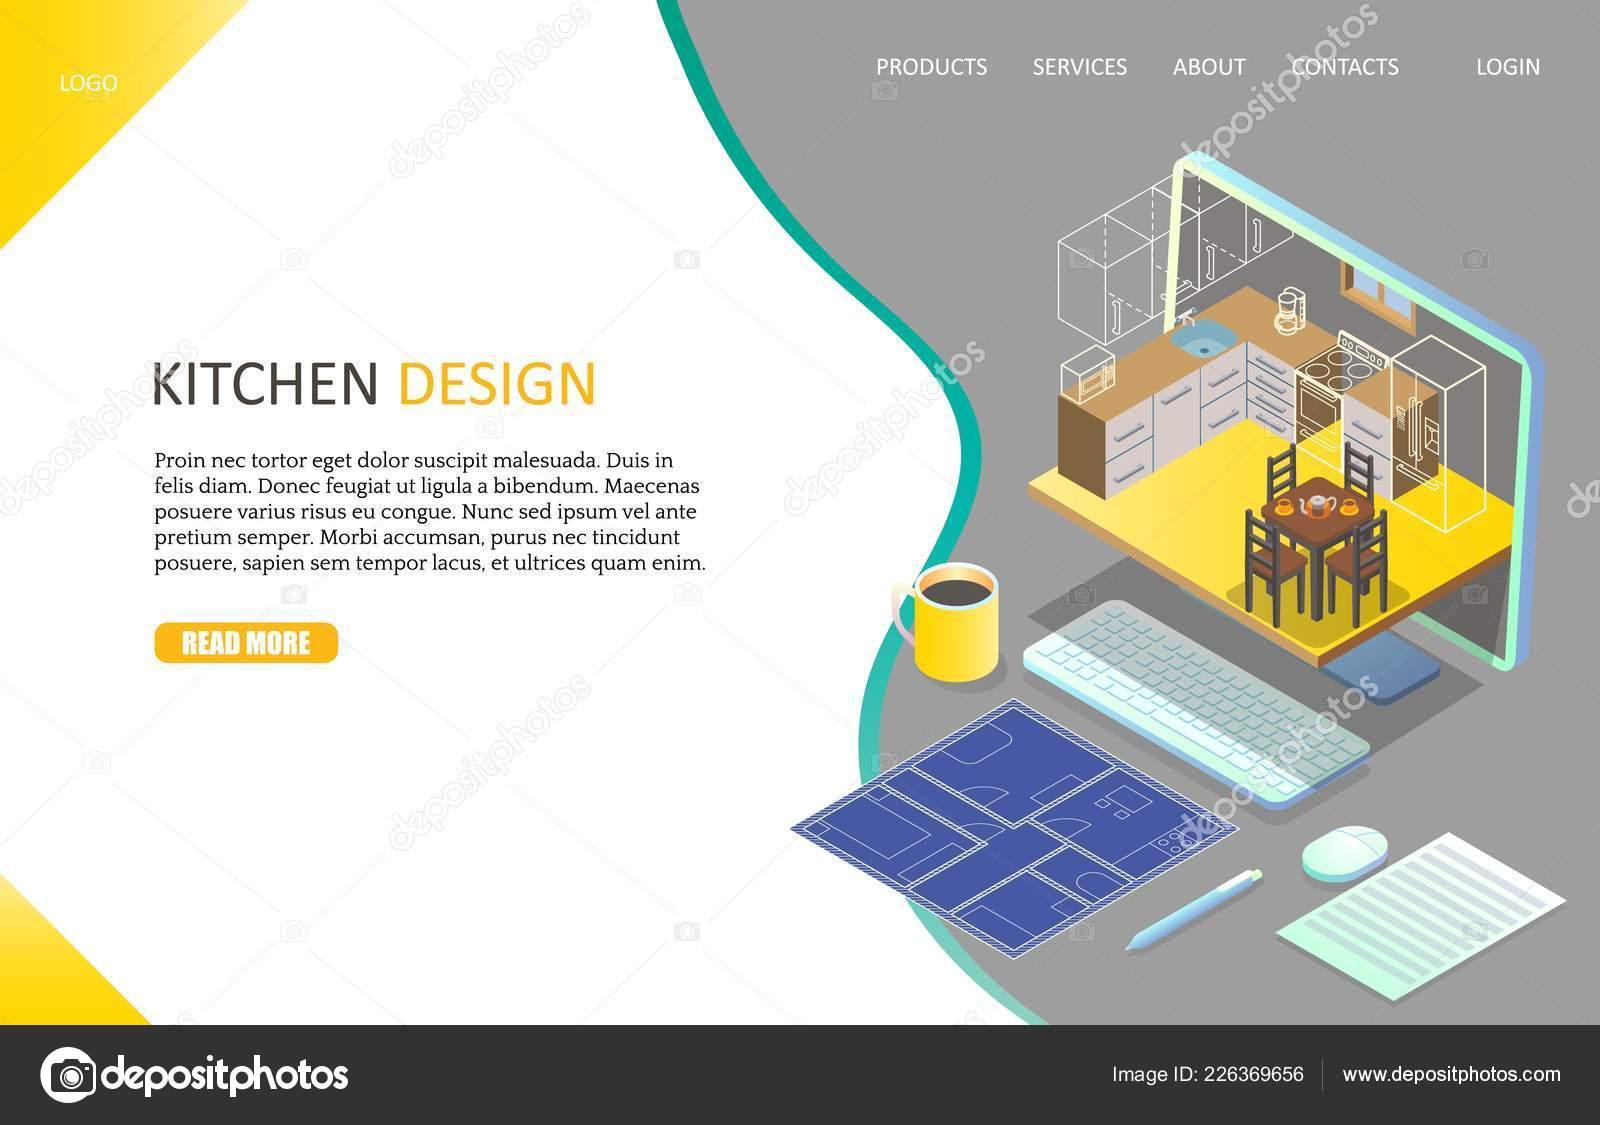 kitchen design template suites 厨房设计登陆页面网站矢量模板 图库矢量图像 c siberianart 226369656 图库矢量图片